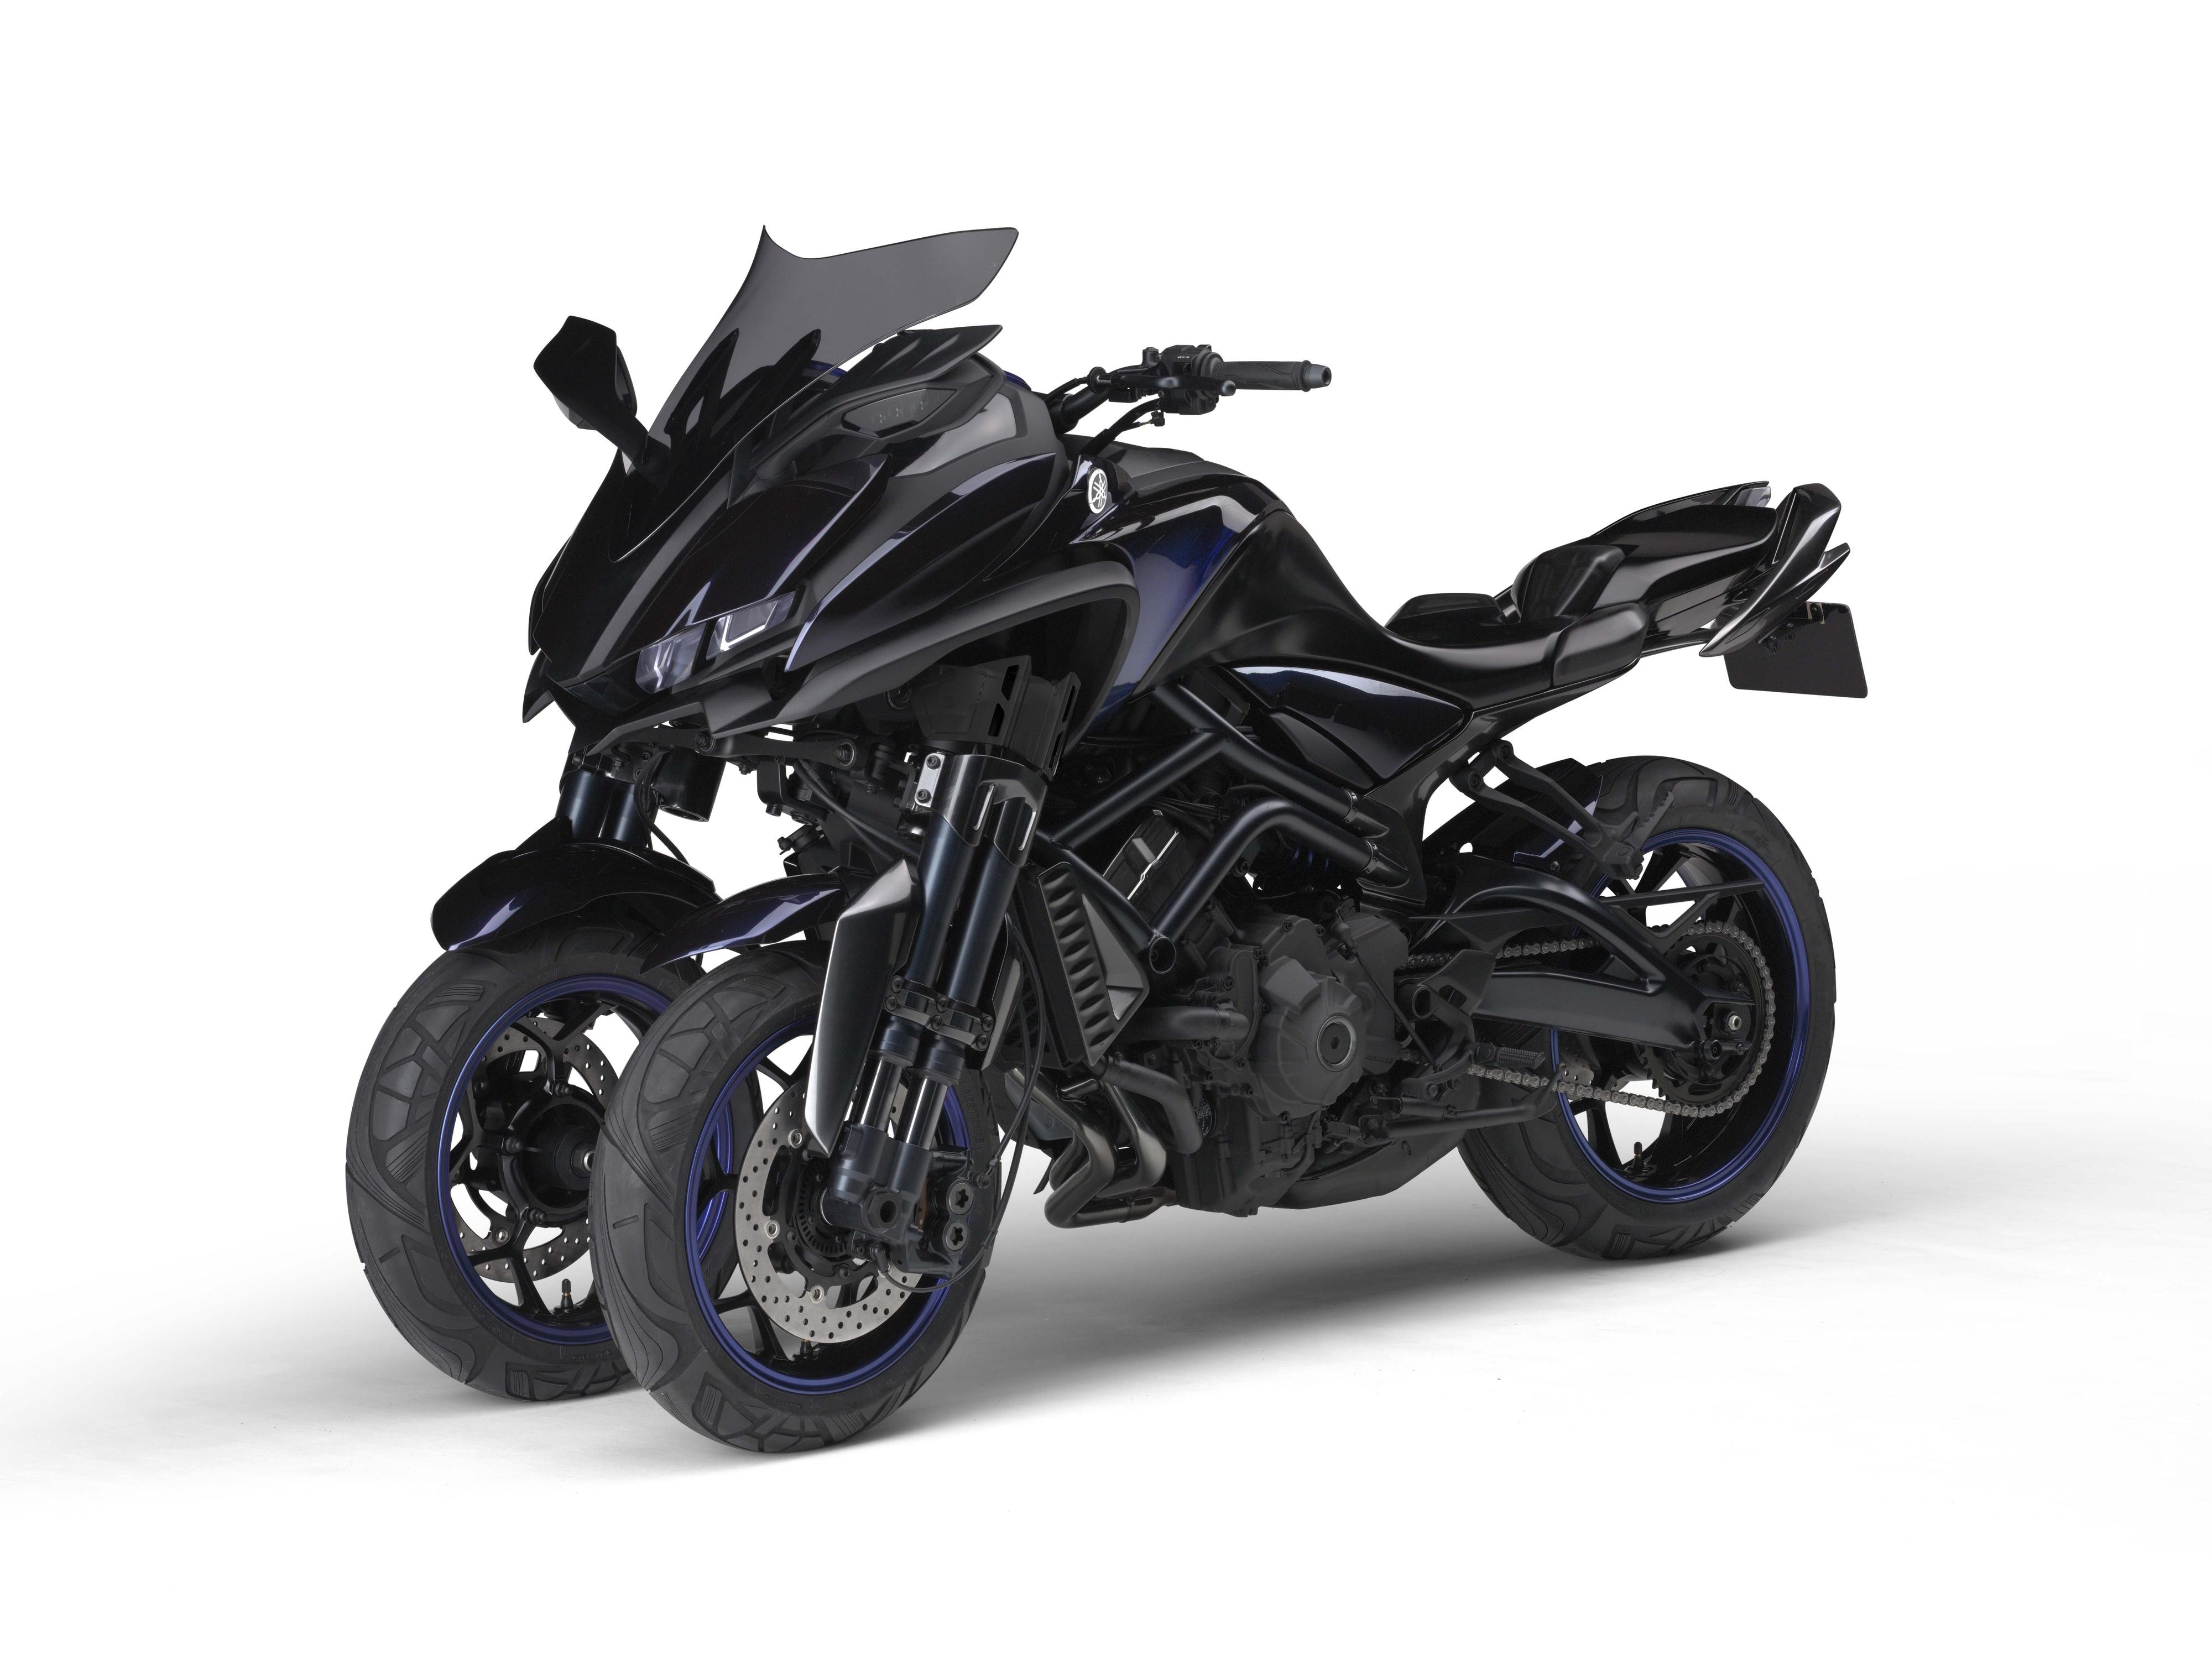 Yamaha's three-wheeled MT-09